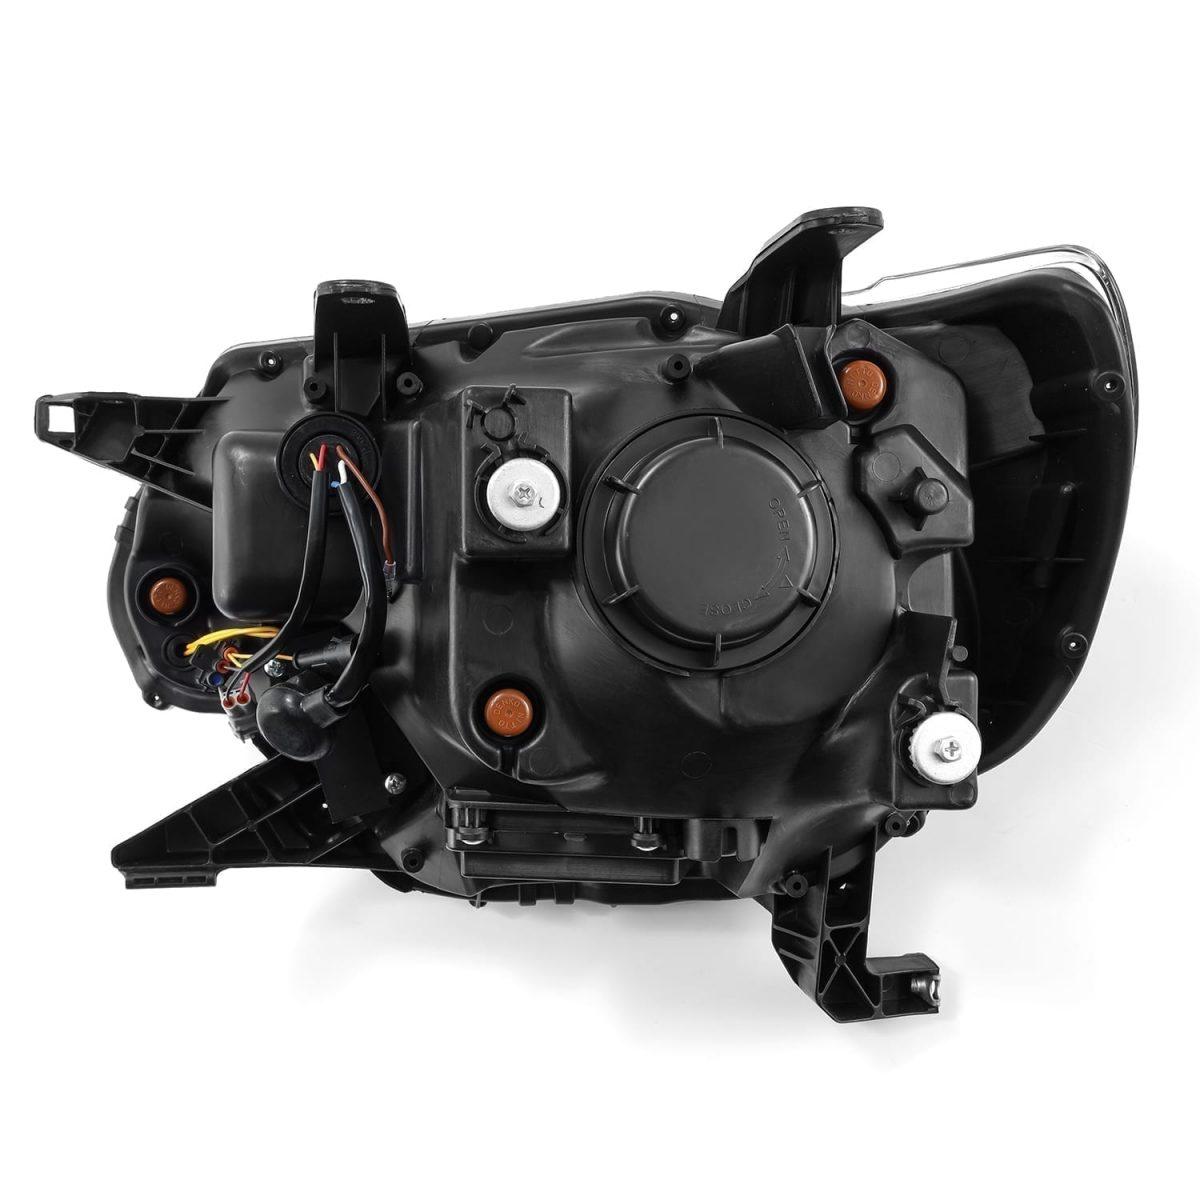 2012 2013 2014 2015 Toyota Tacoma AlphaRex PRO-Series/LUXX-Series Projector Headlights